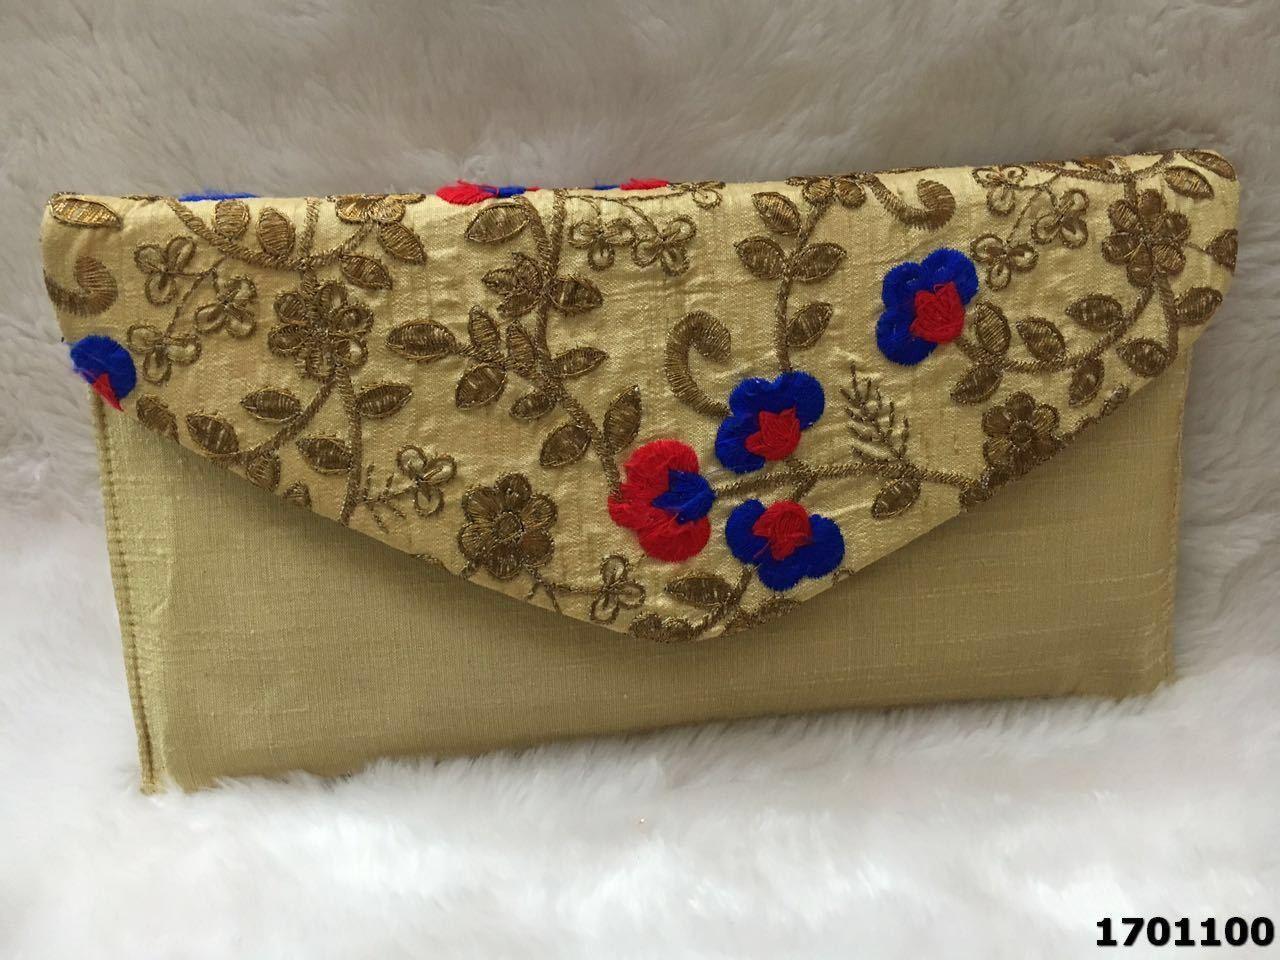 Latest Floral Design Evening Clutch Bag